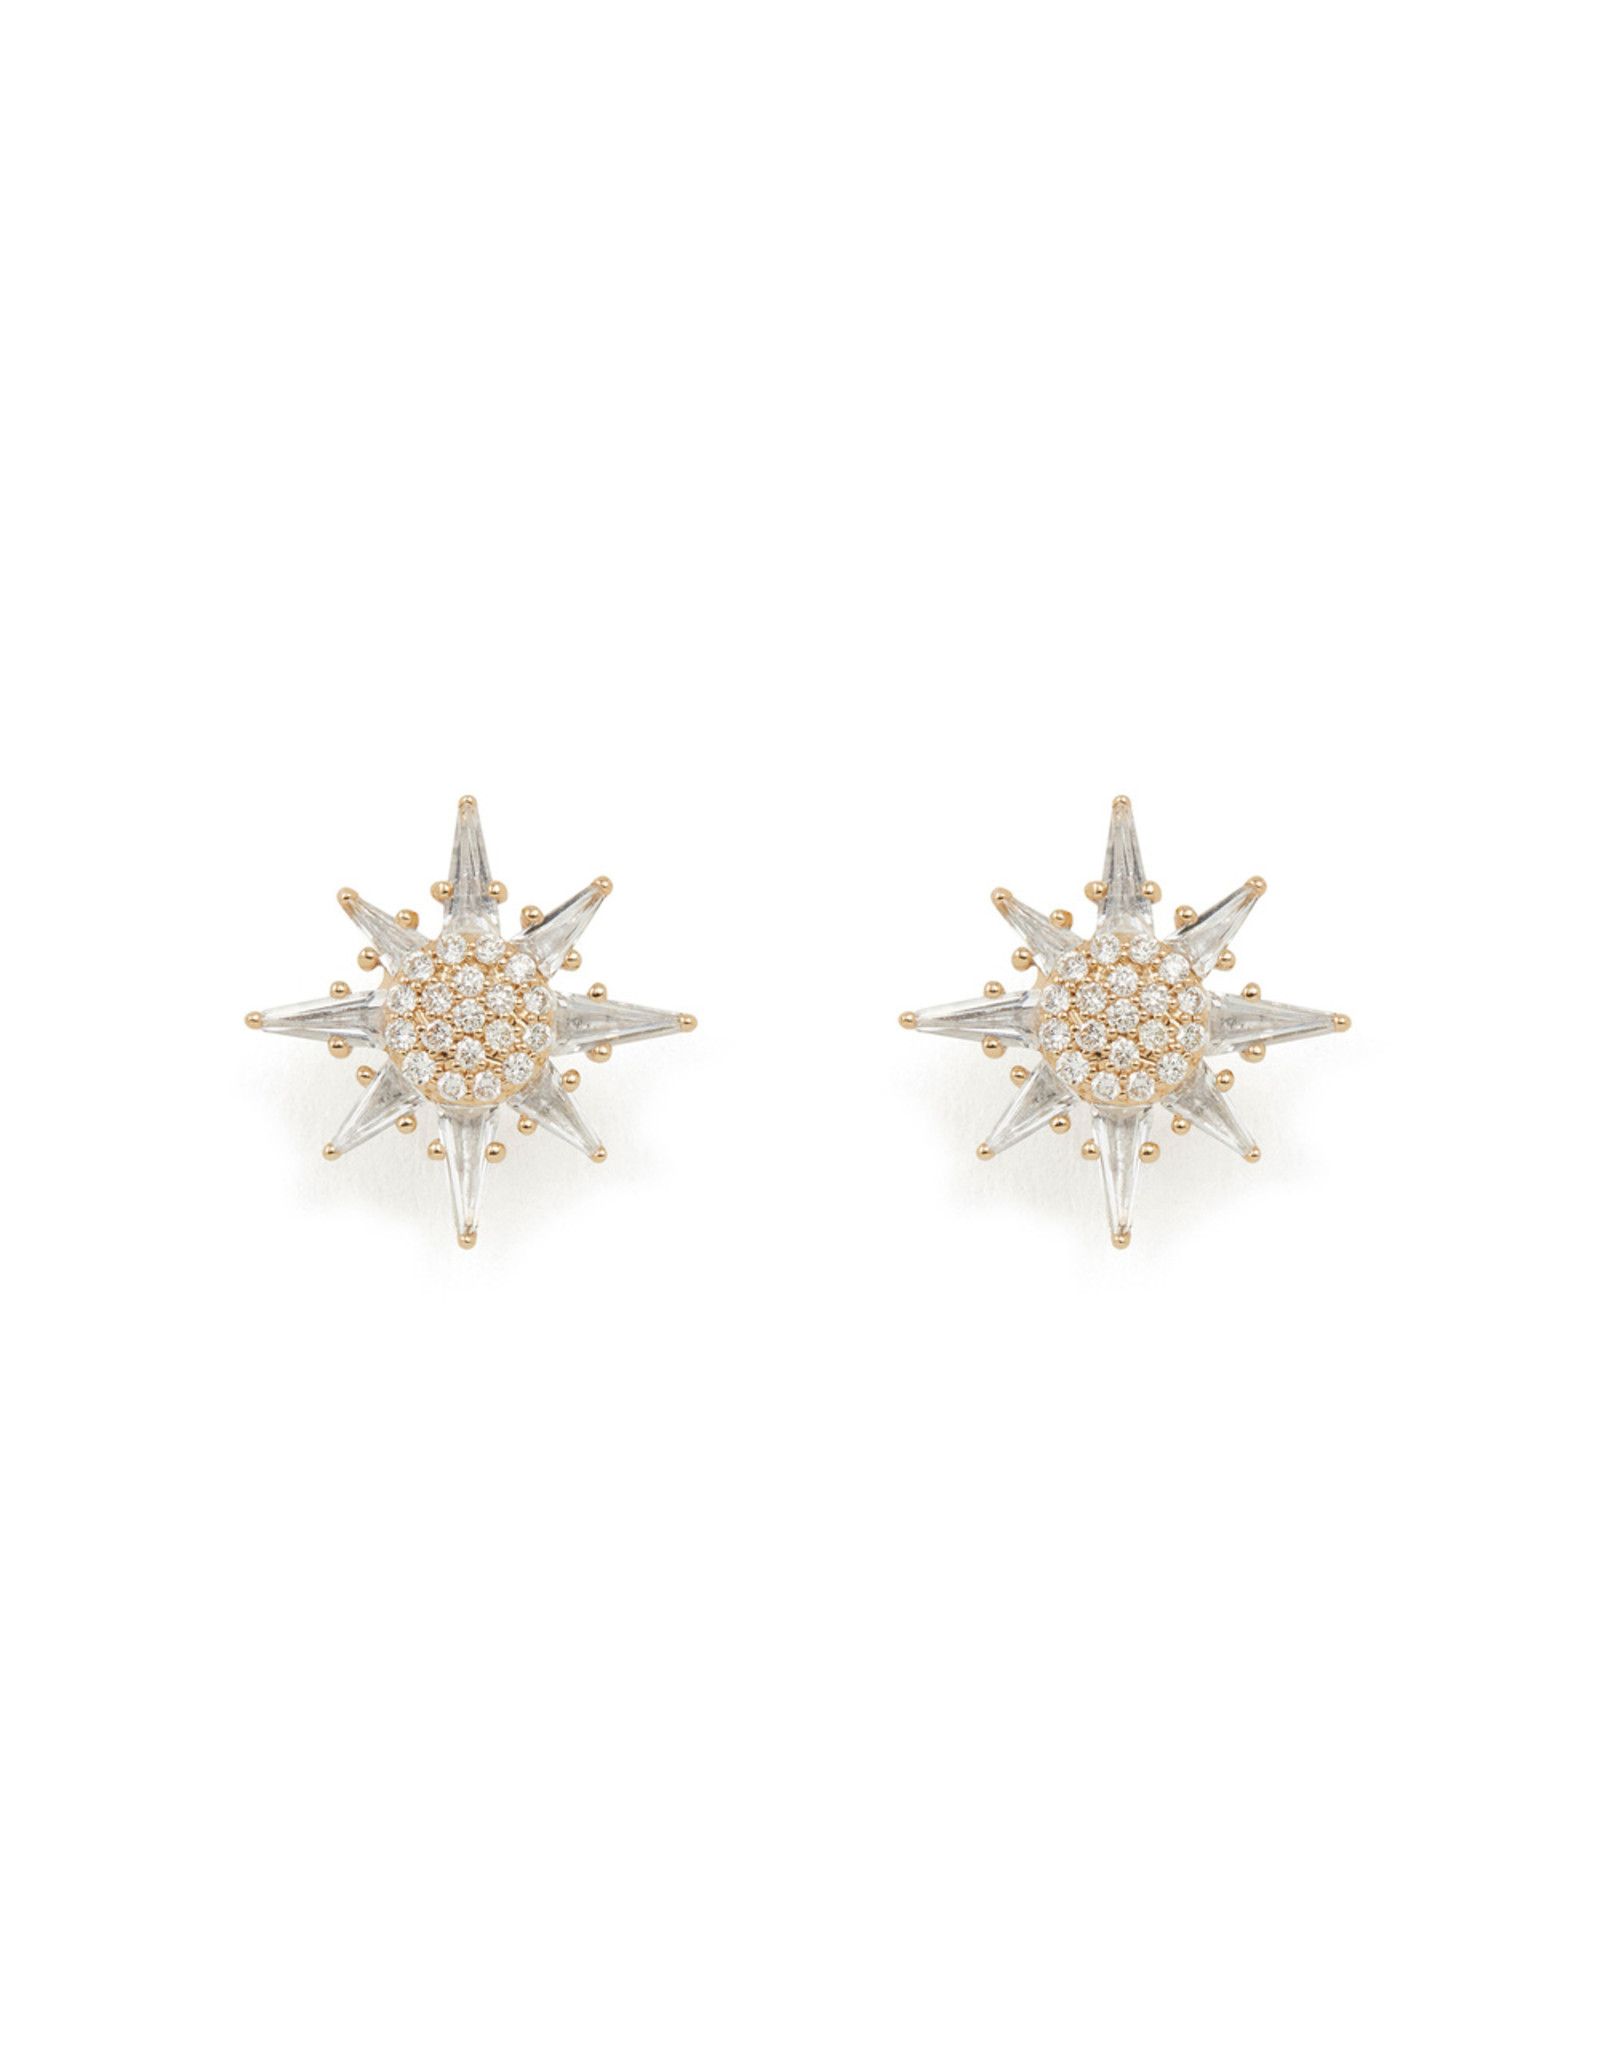 Bondeye Jewelry Bondeye Calypso White Topaz Star Stud Earrings (Color: Yellow Gold)